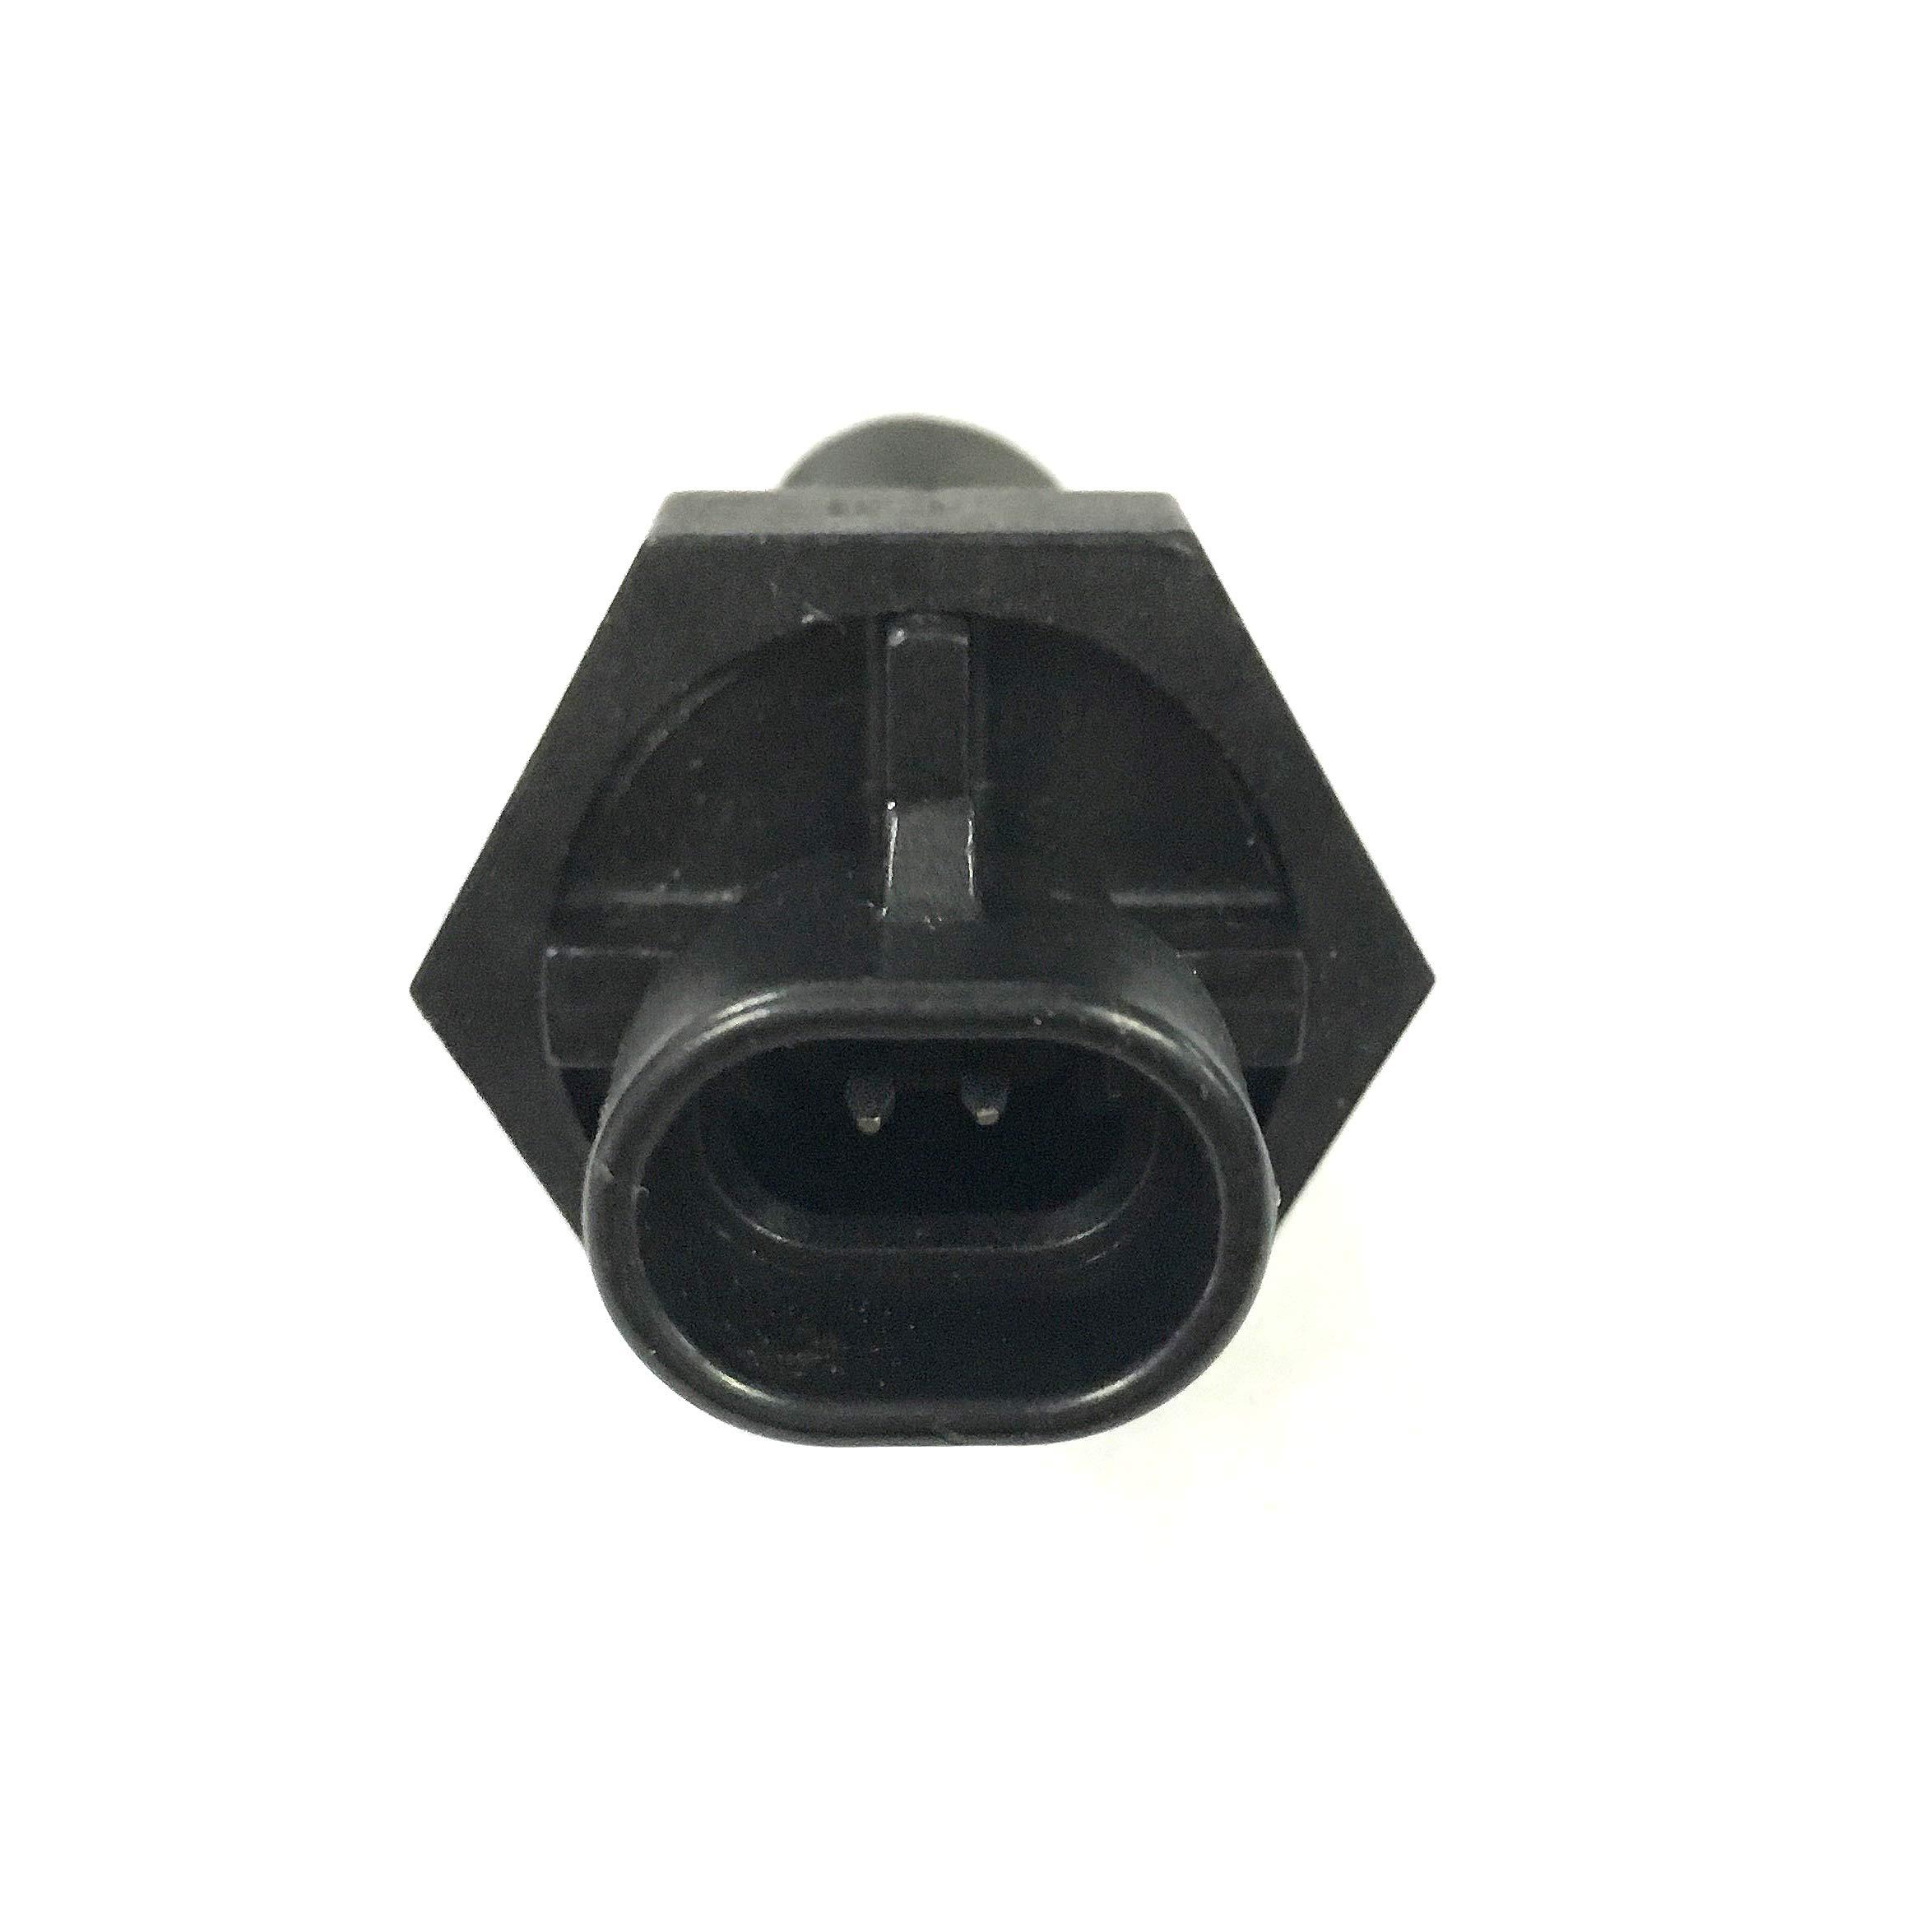 BAIXINDE Magnetic Speed Sensor for International Harvester 3528003C1 1552SC 505-5105